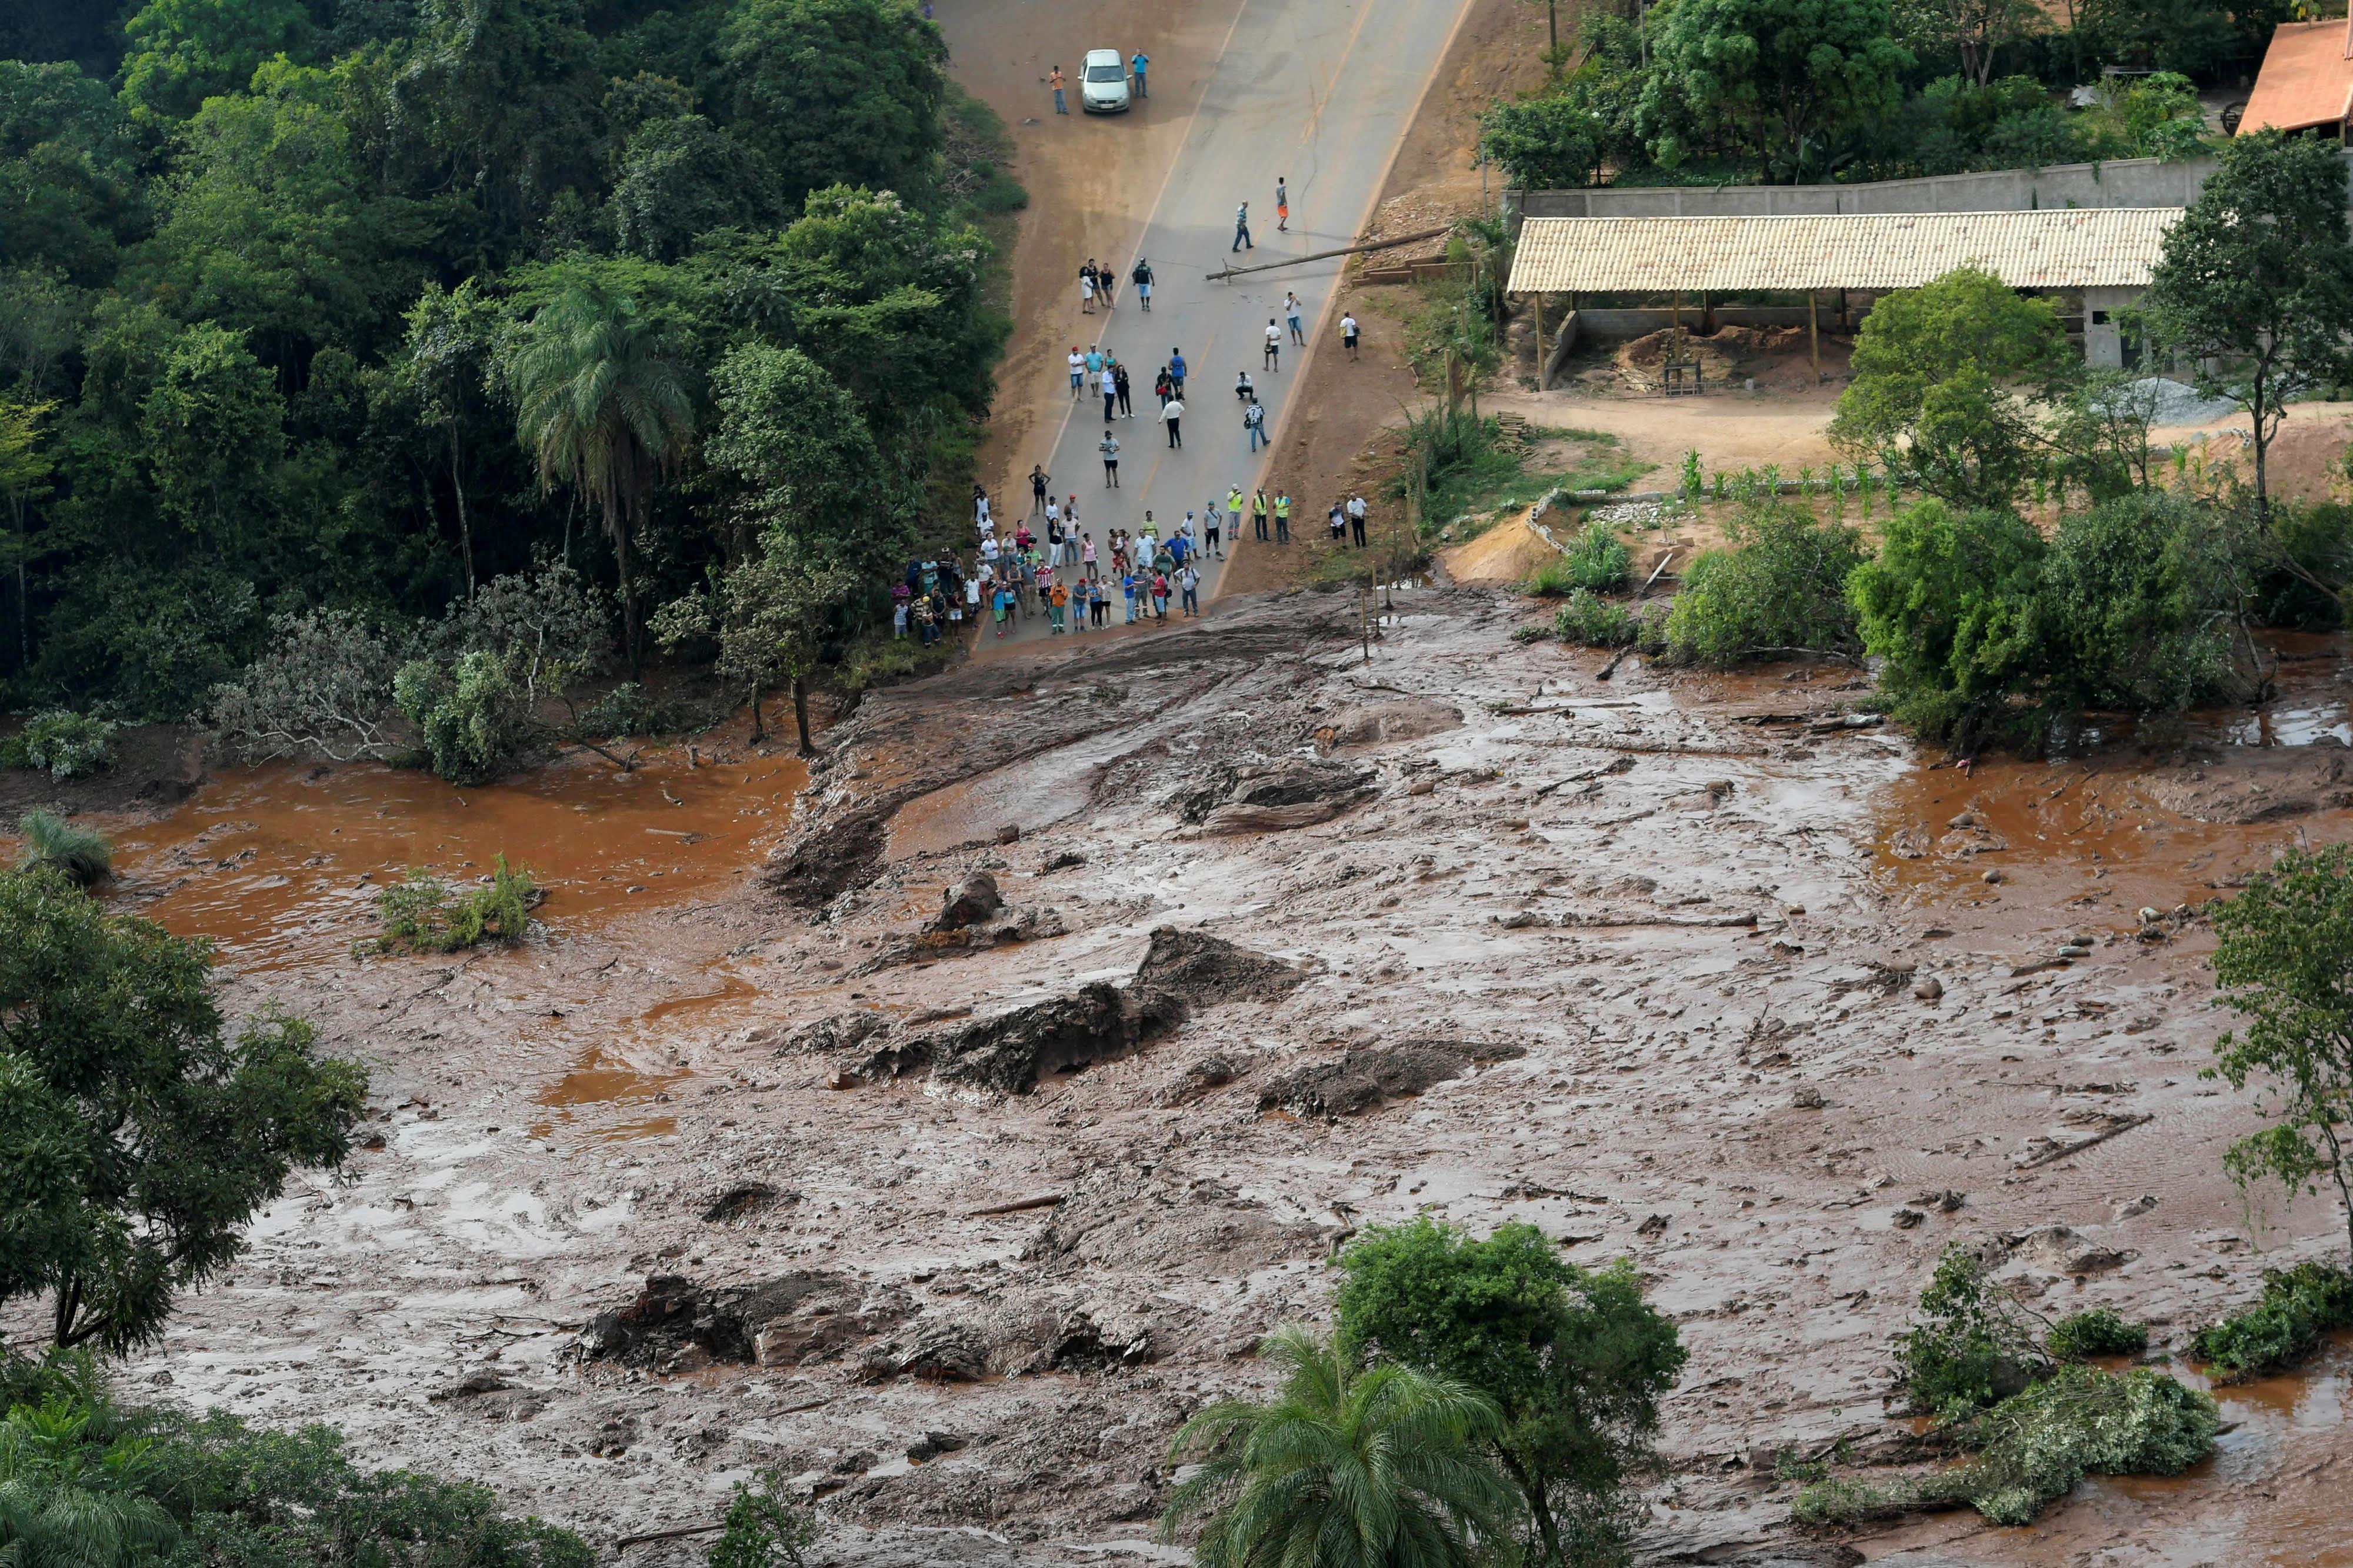 RT: Dam collapse Brazil Vale mine 190125